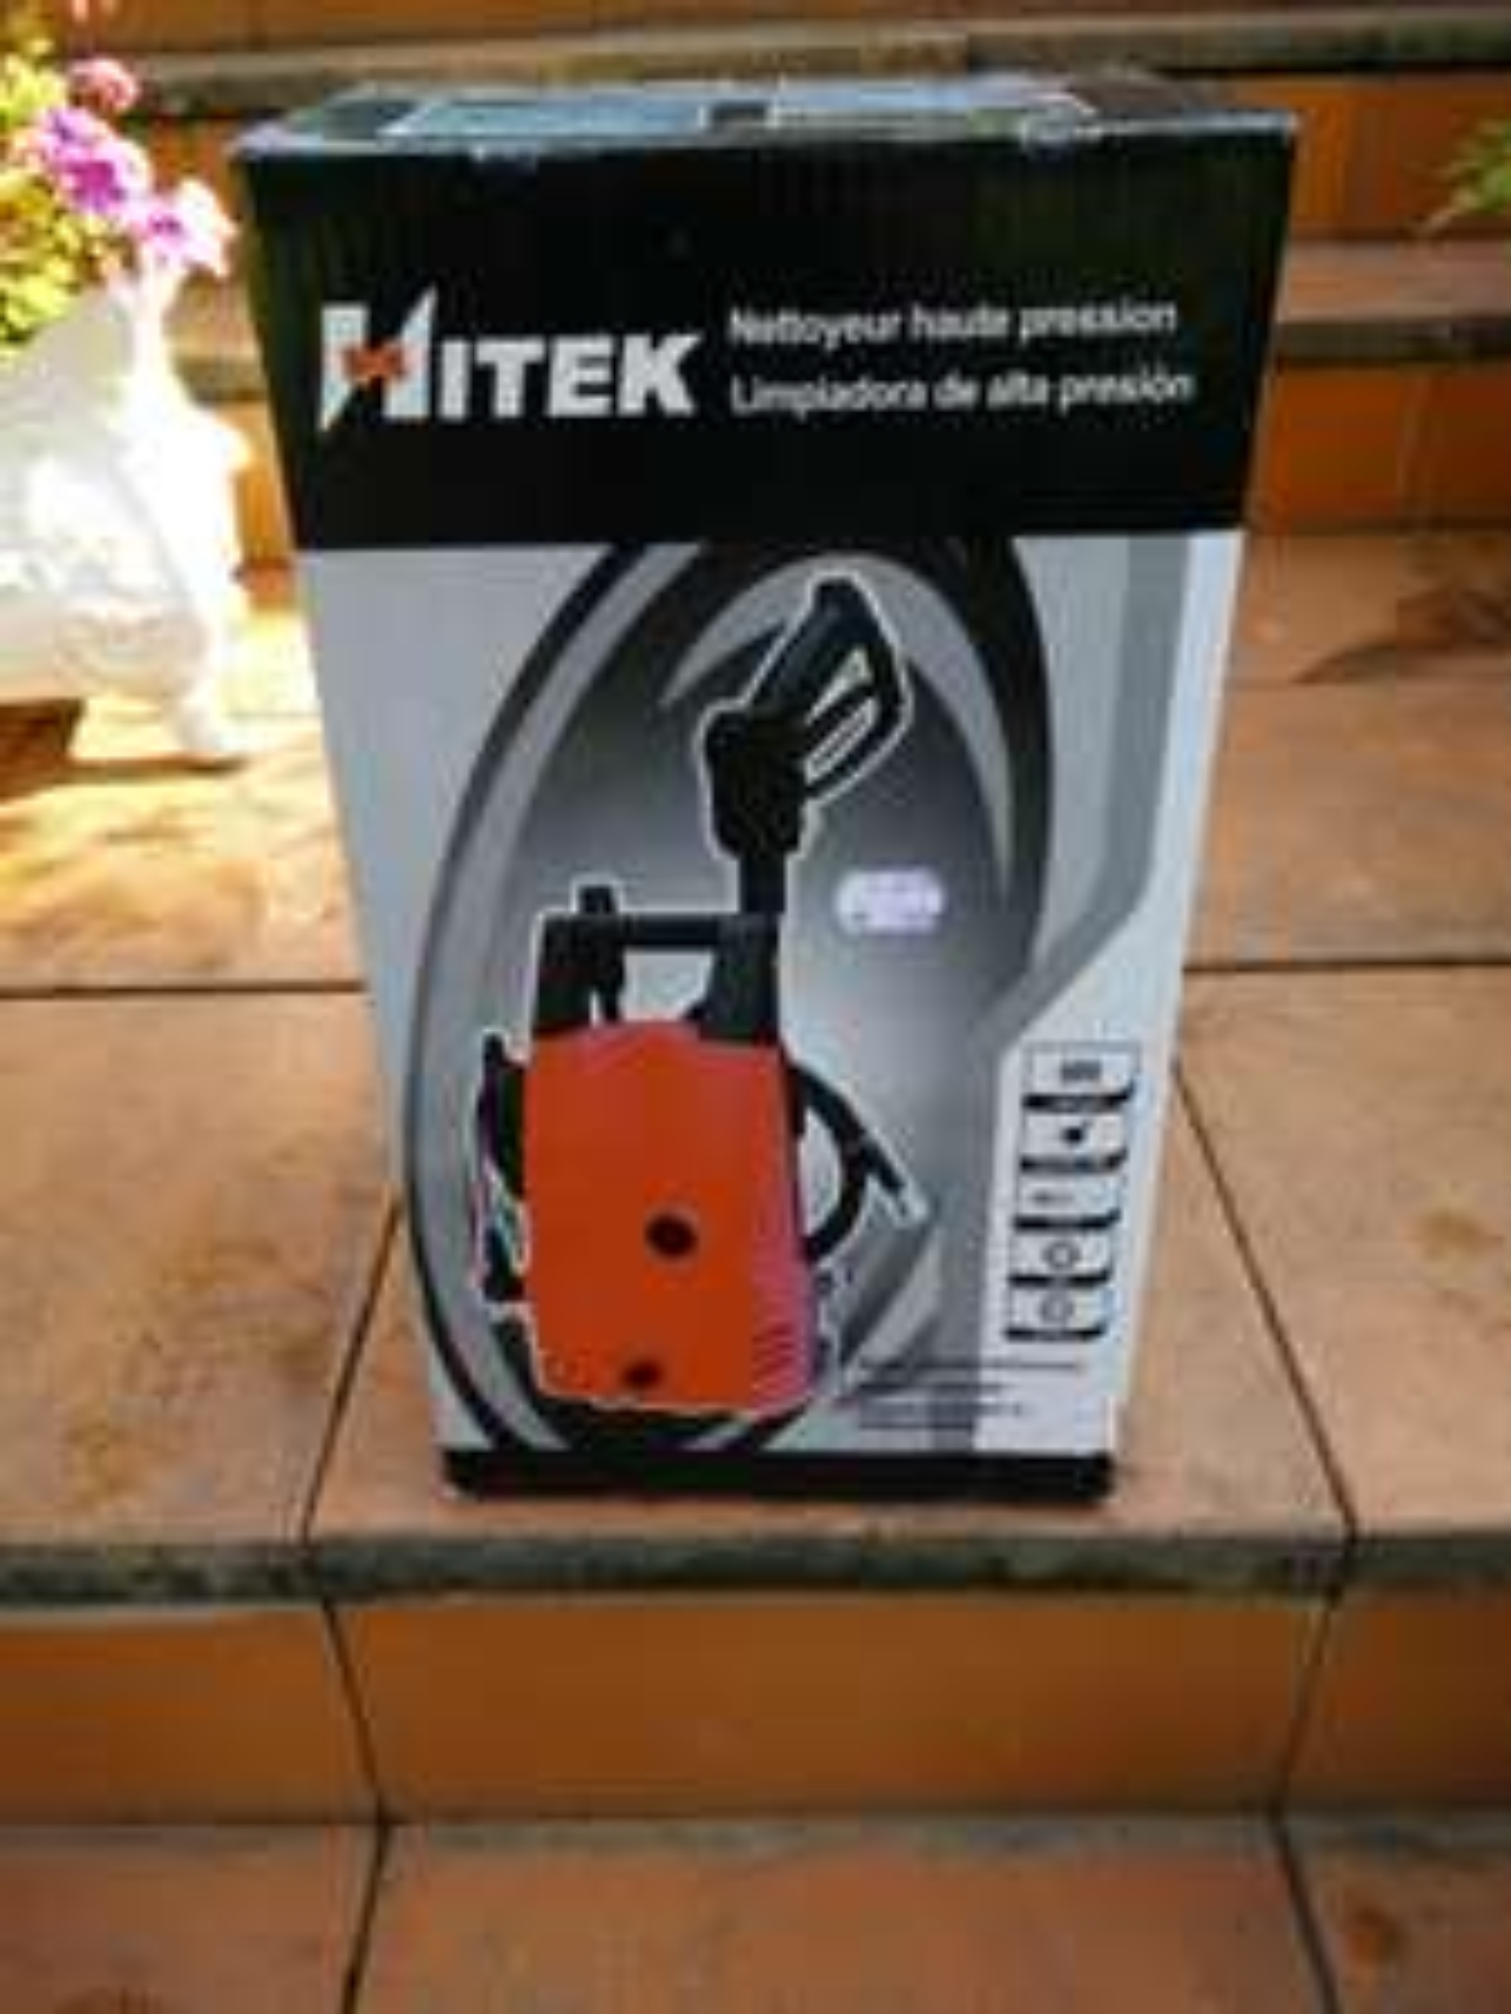 Nettoyeur Haute-Pression Hitek DY65126 - 1400W - 5L/min - 7Mpa